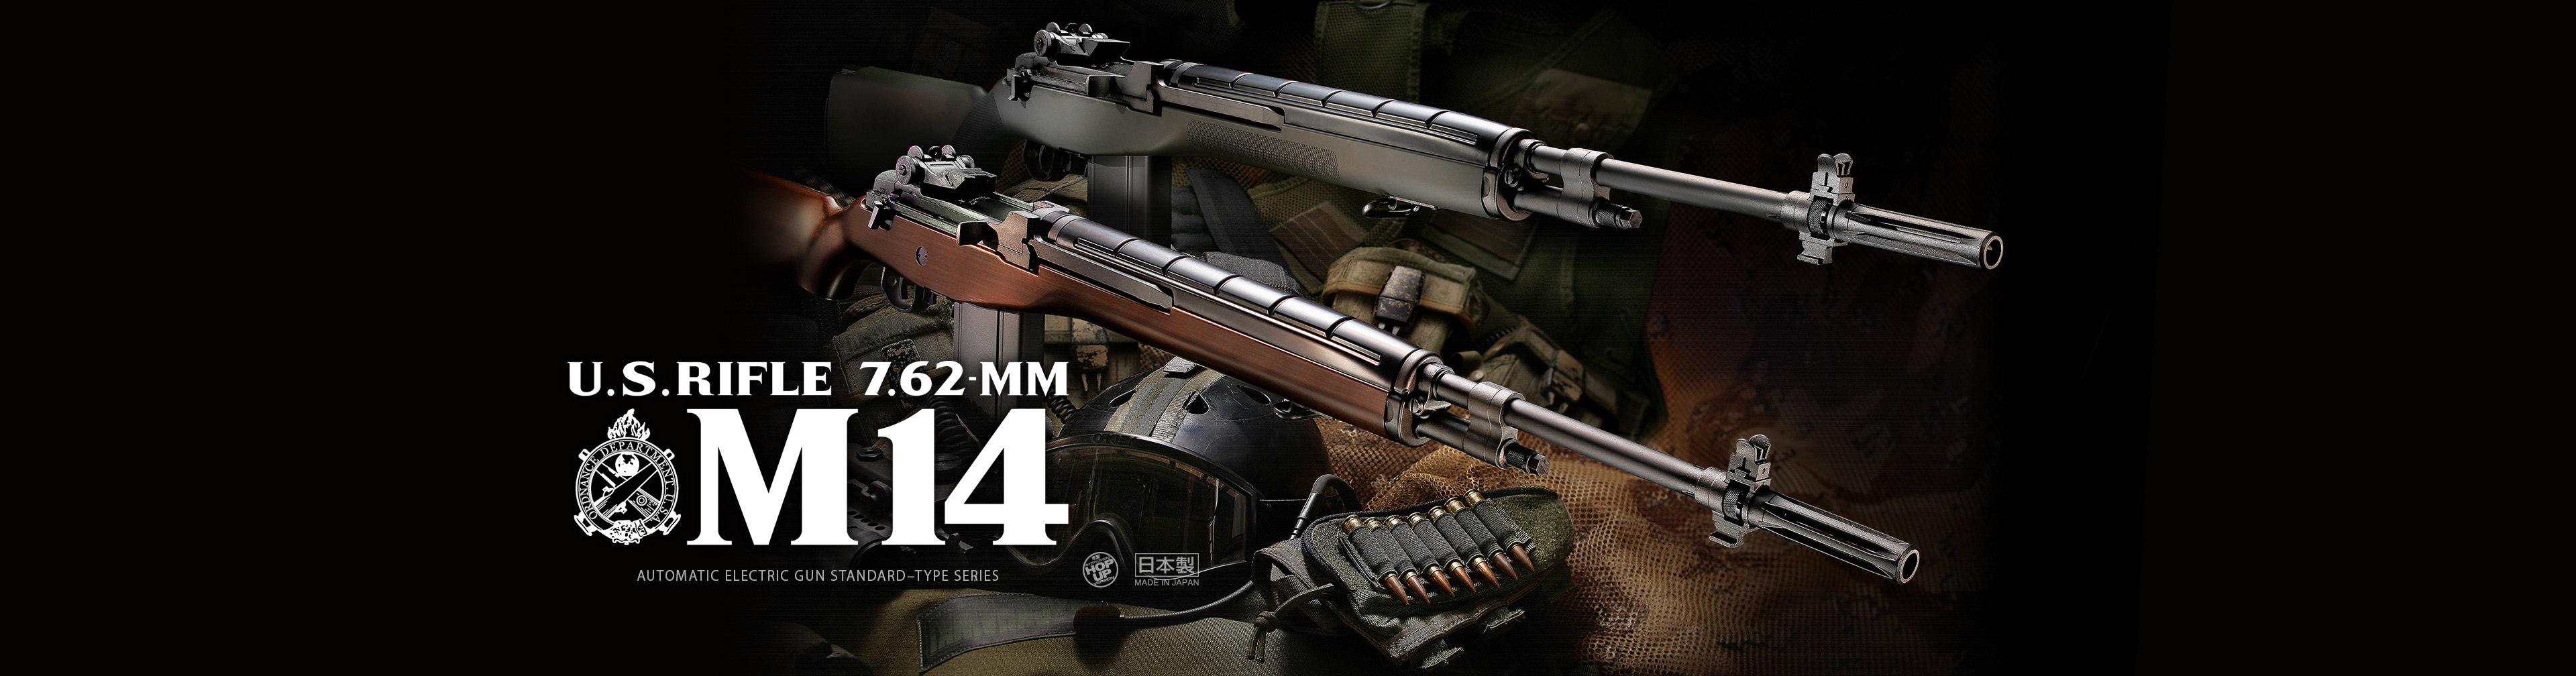 U.S.ライフル M14 ファイバータイプO.D.ストックver.